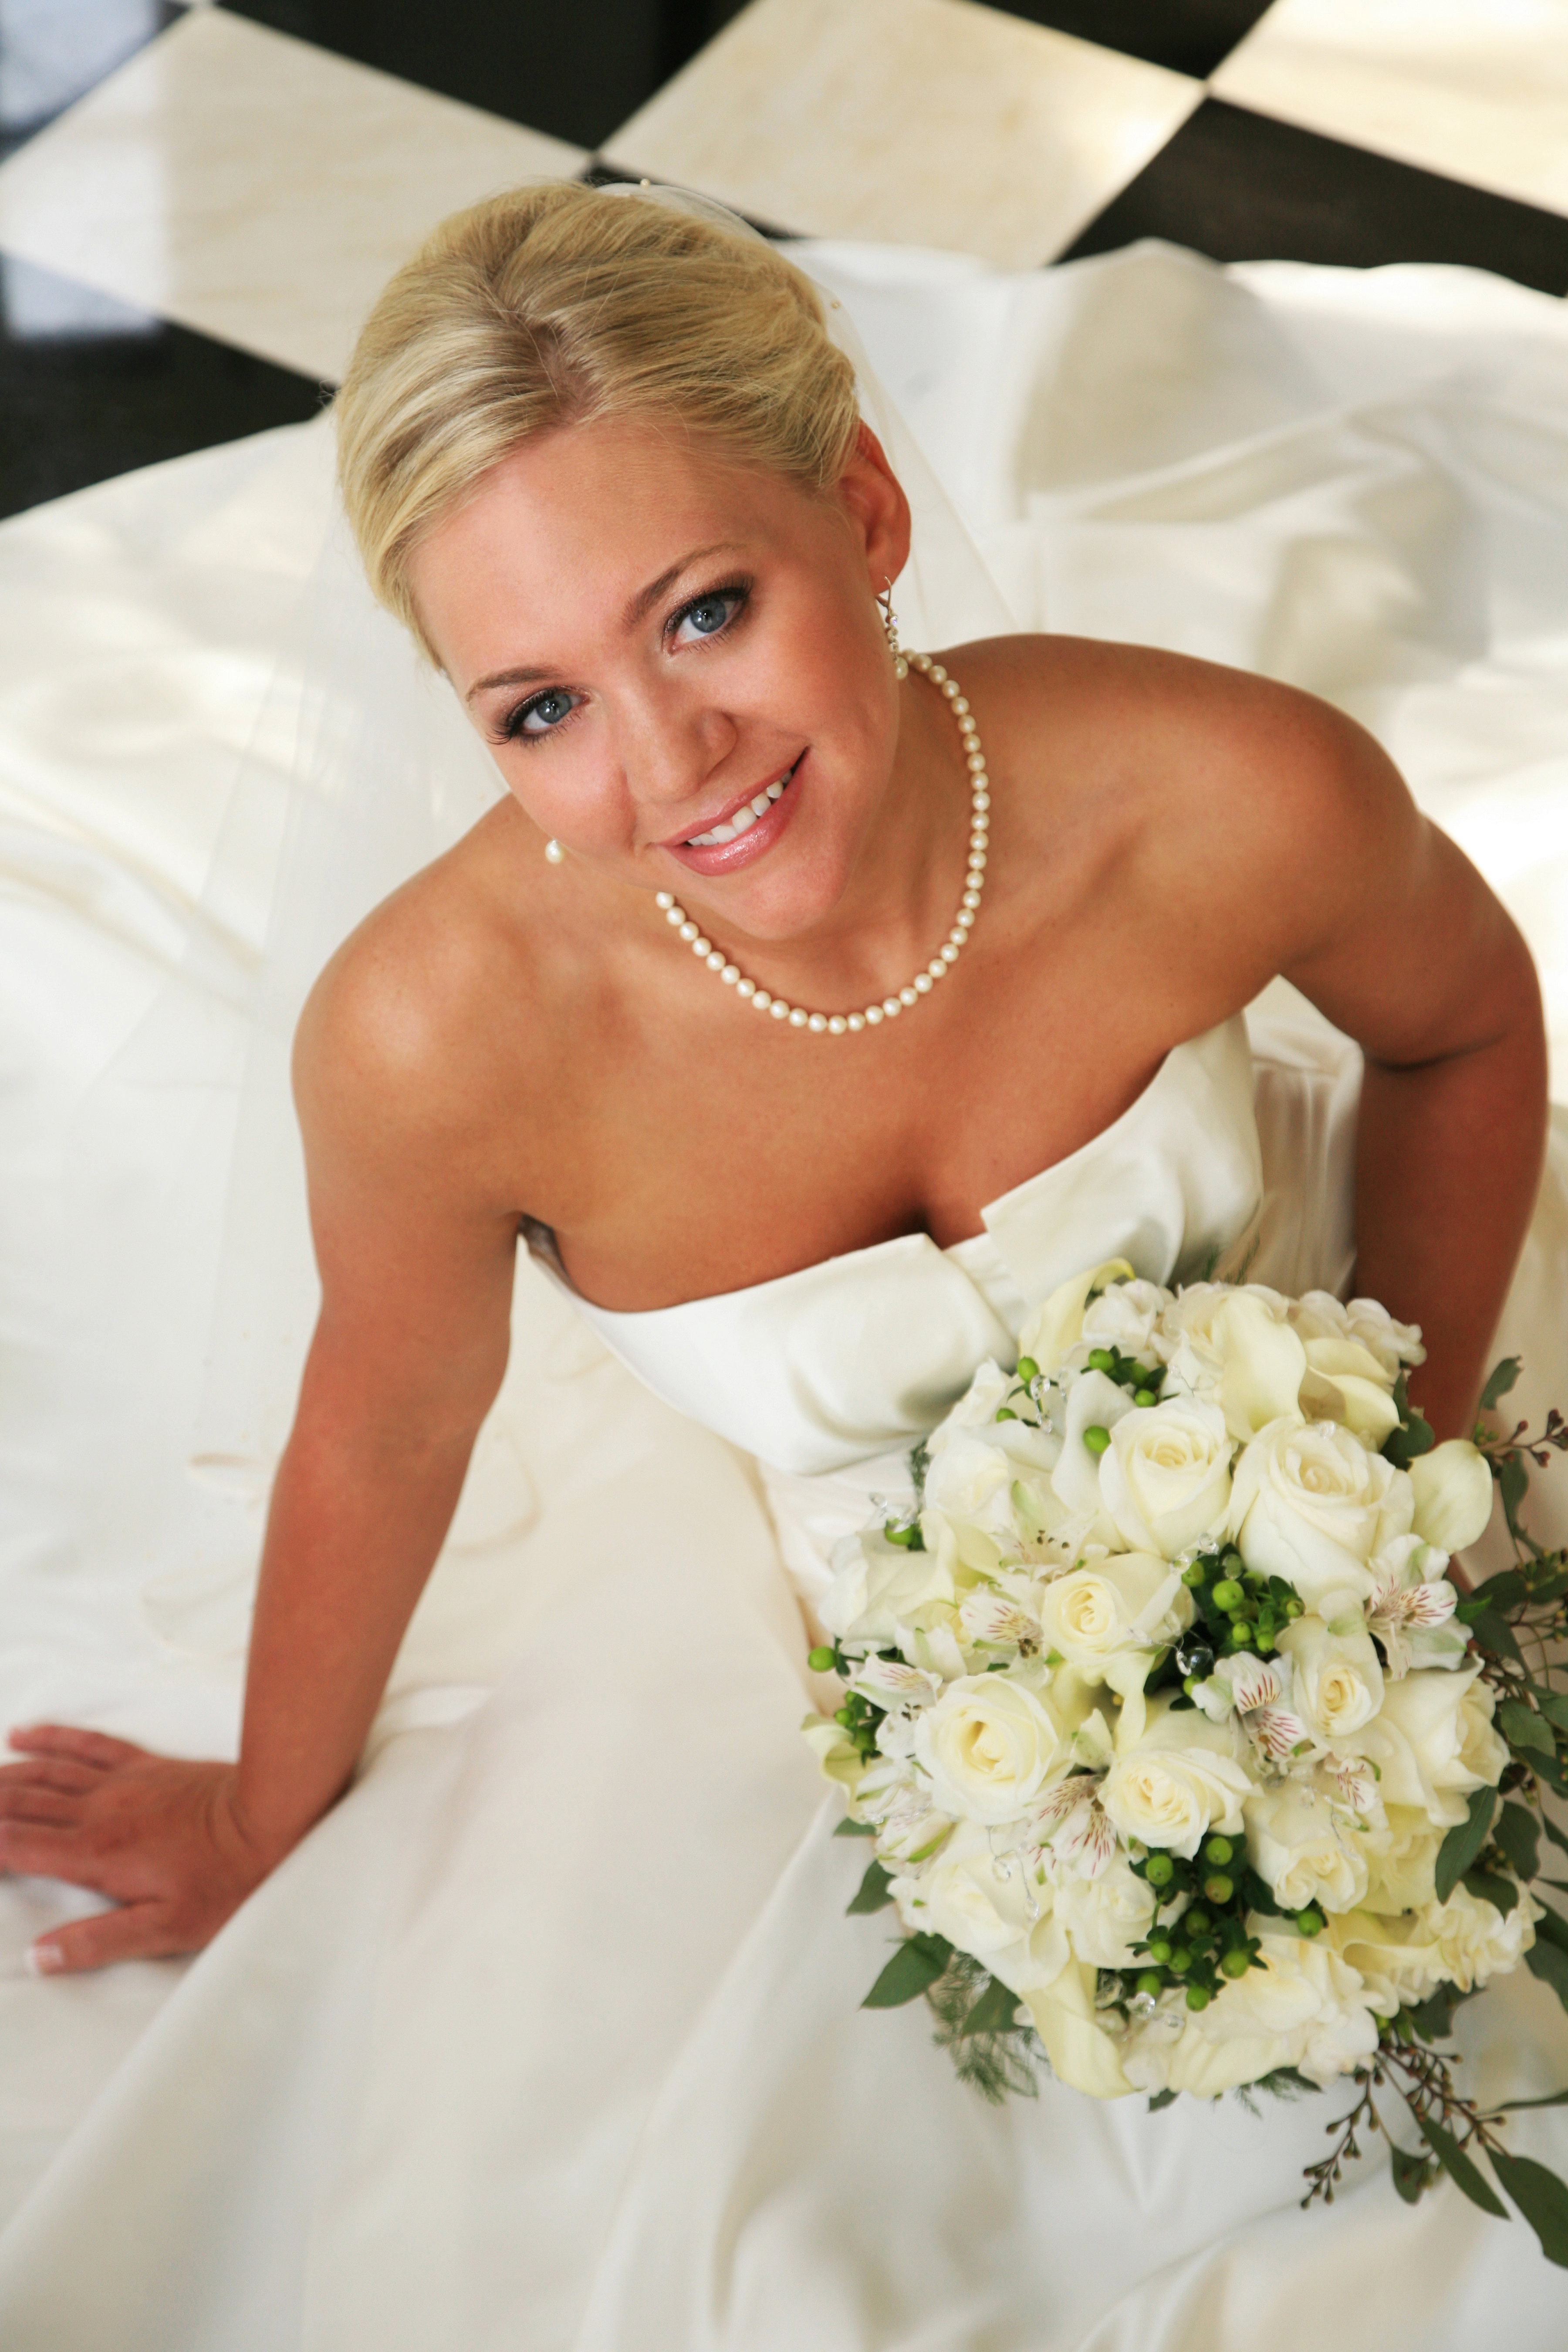 Beauty, Inspiration, Flowers & Decor, Jewelry, Wedding Dresses, Fashion, white, yellow, black, dress, Flowers, Hair, Board, Photoplay wedding photography, Flower Wedding Dresses